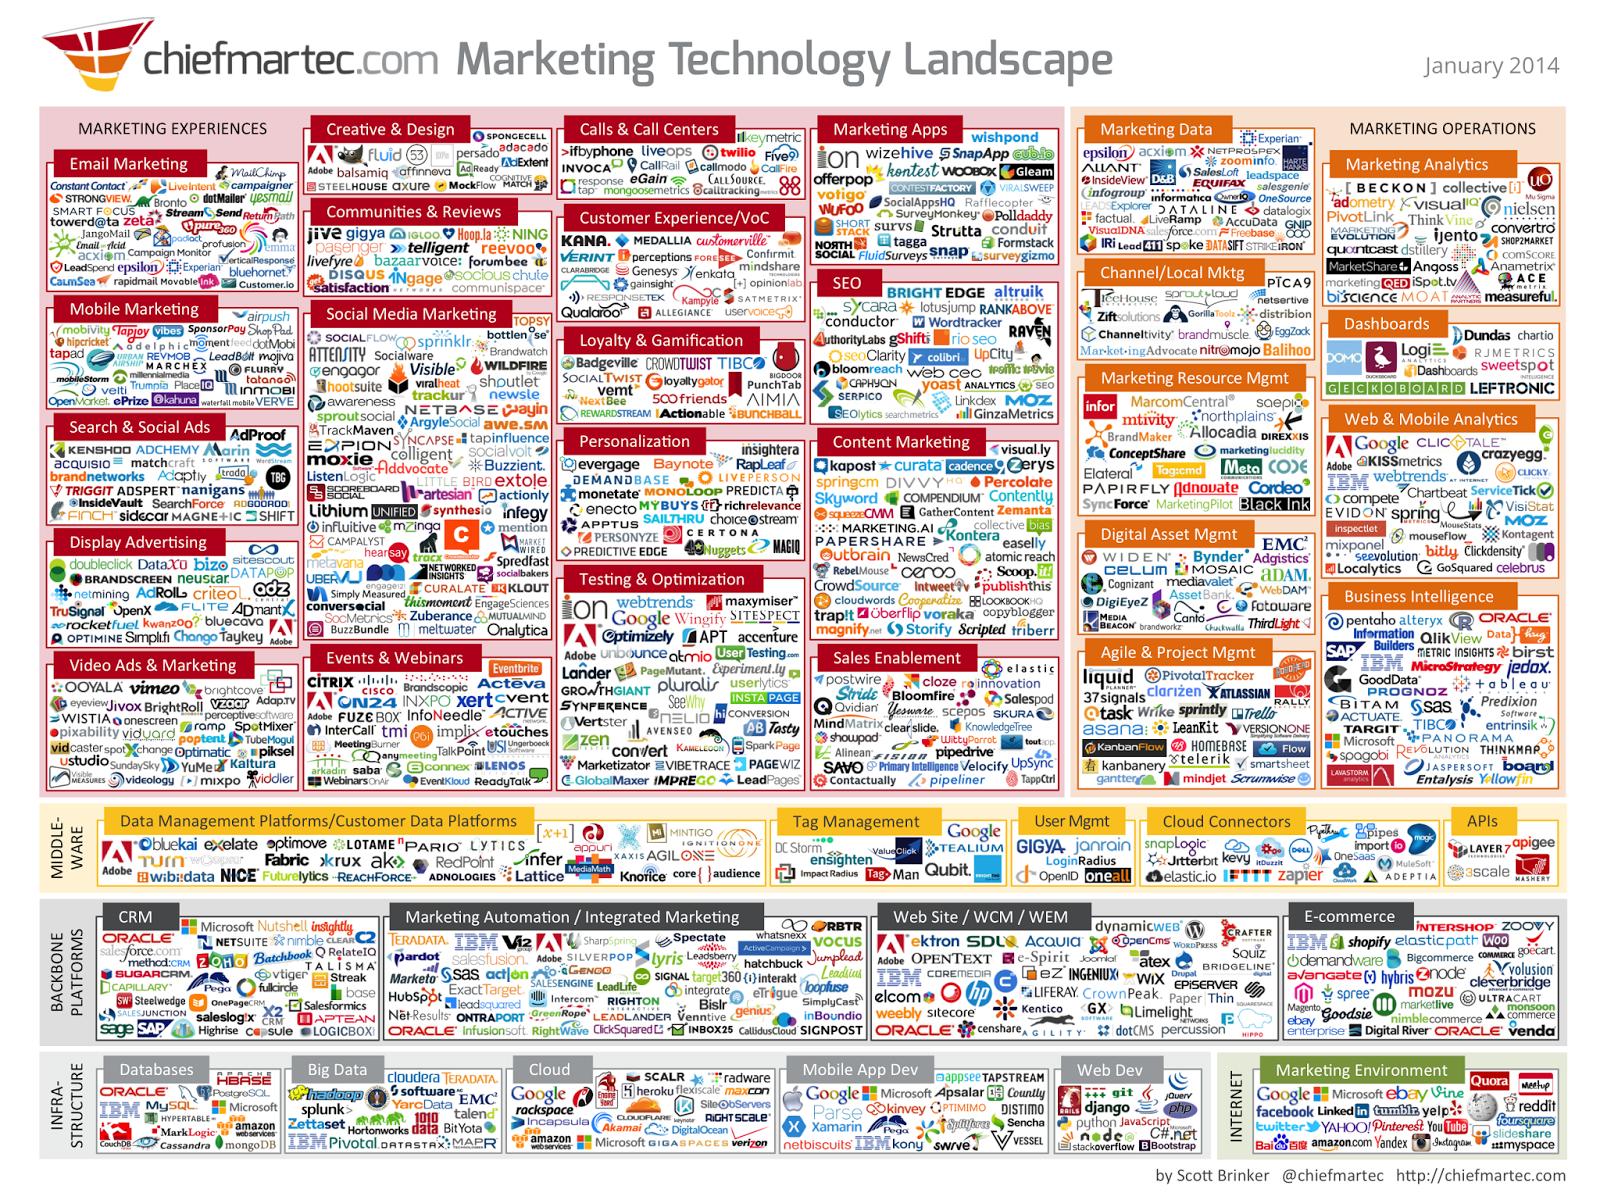 Marketing teknologi udbydere